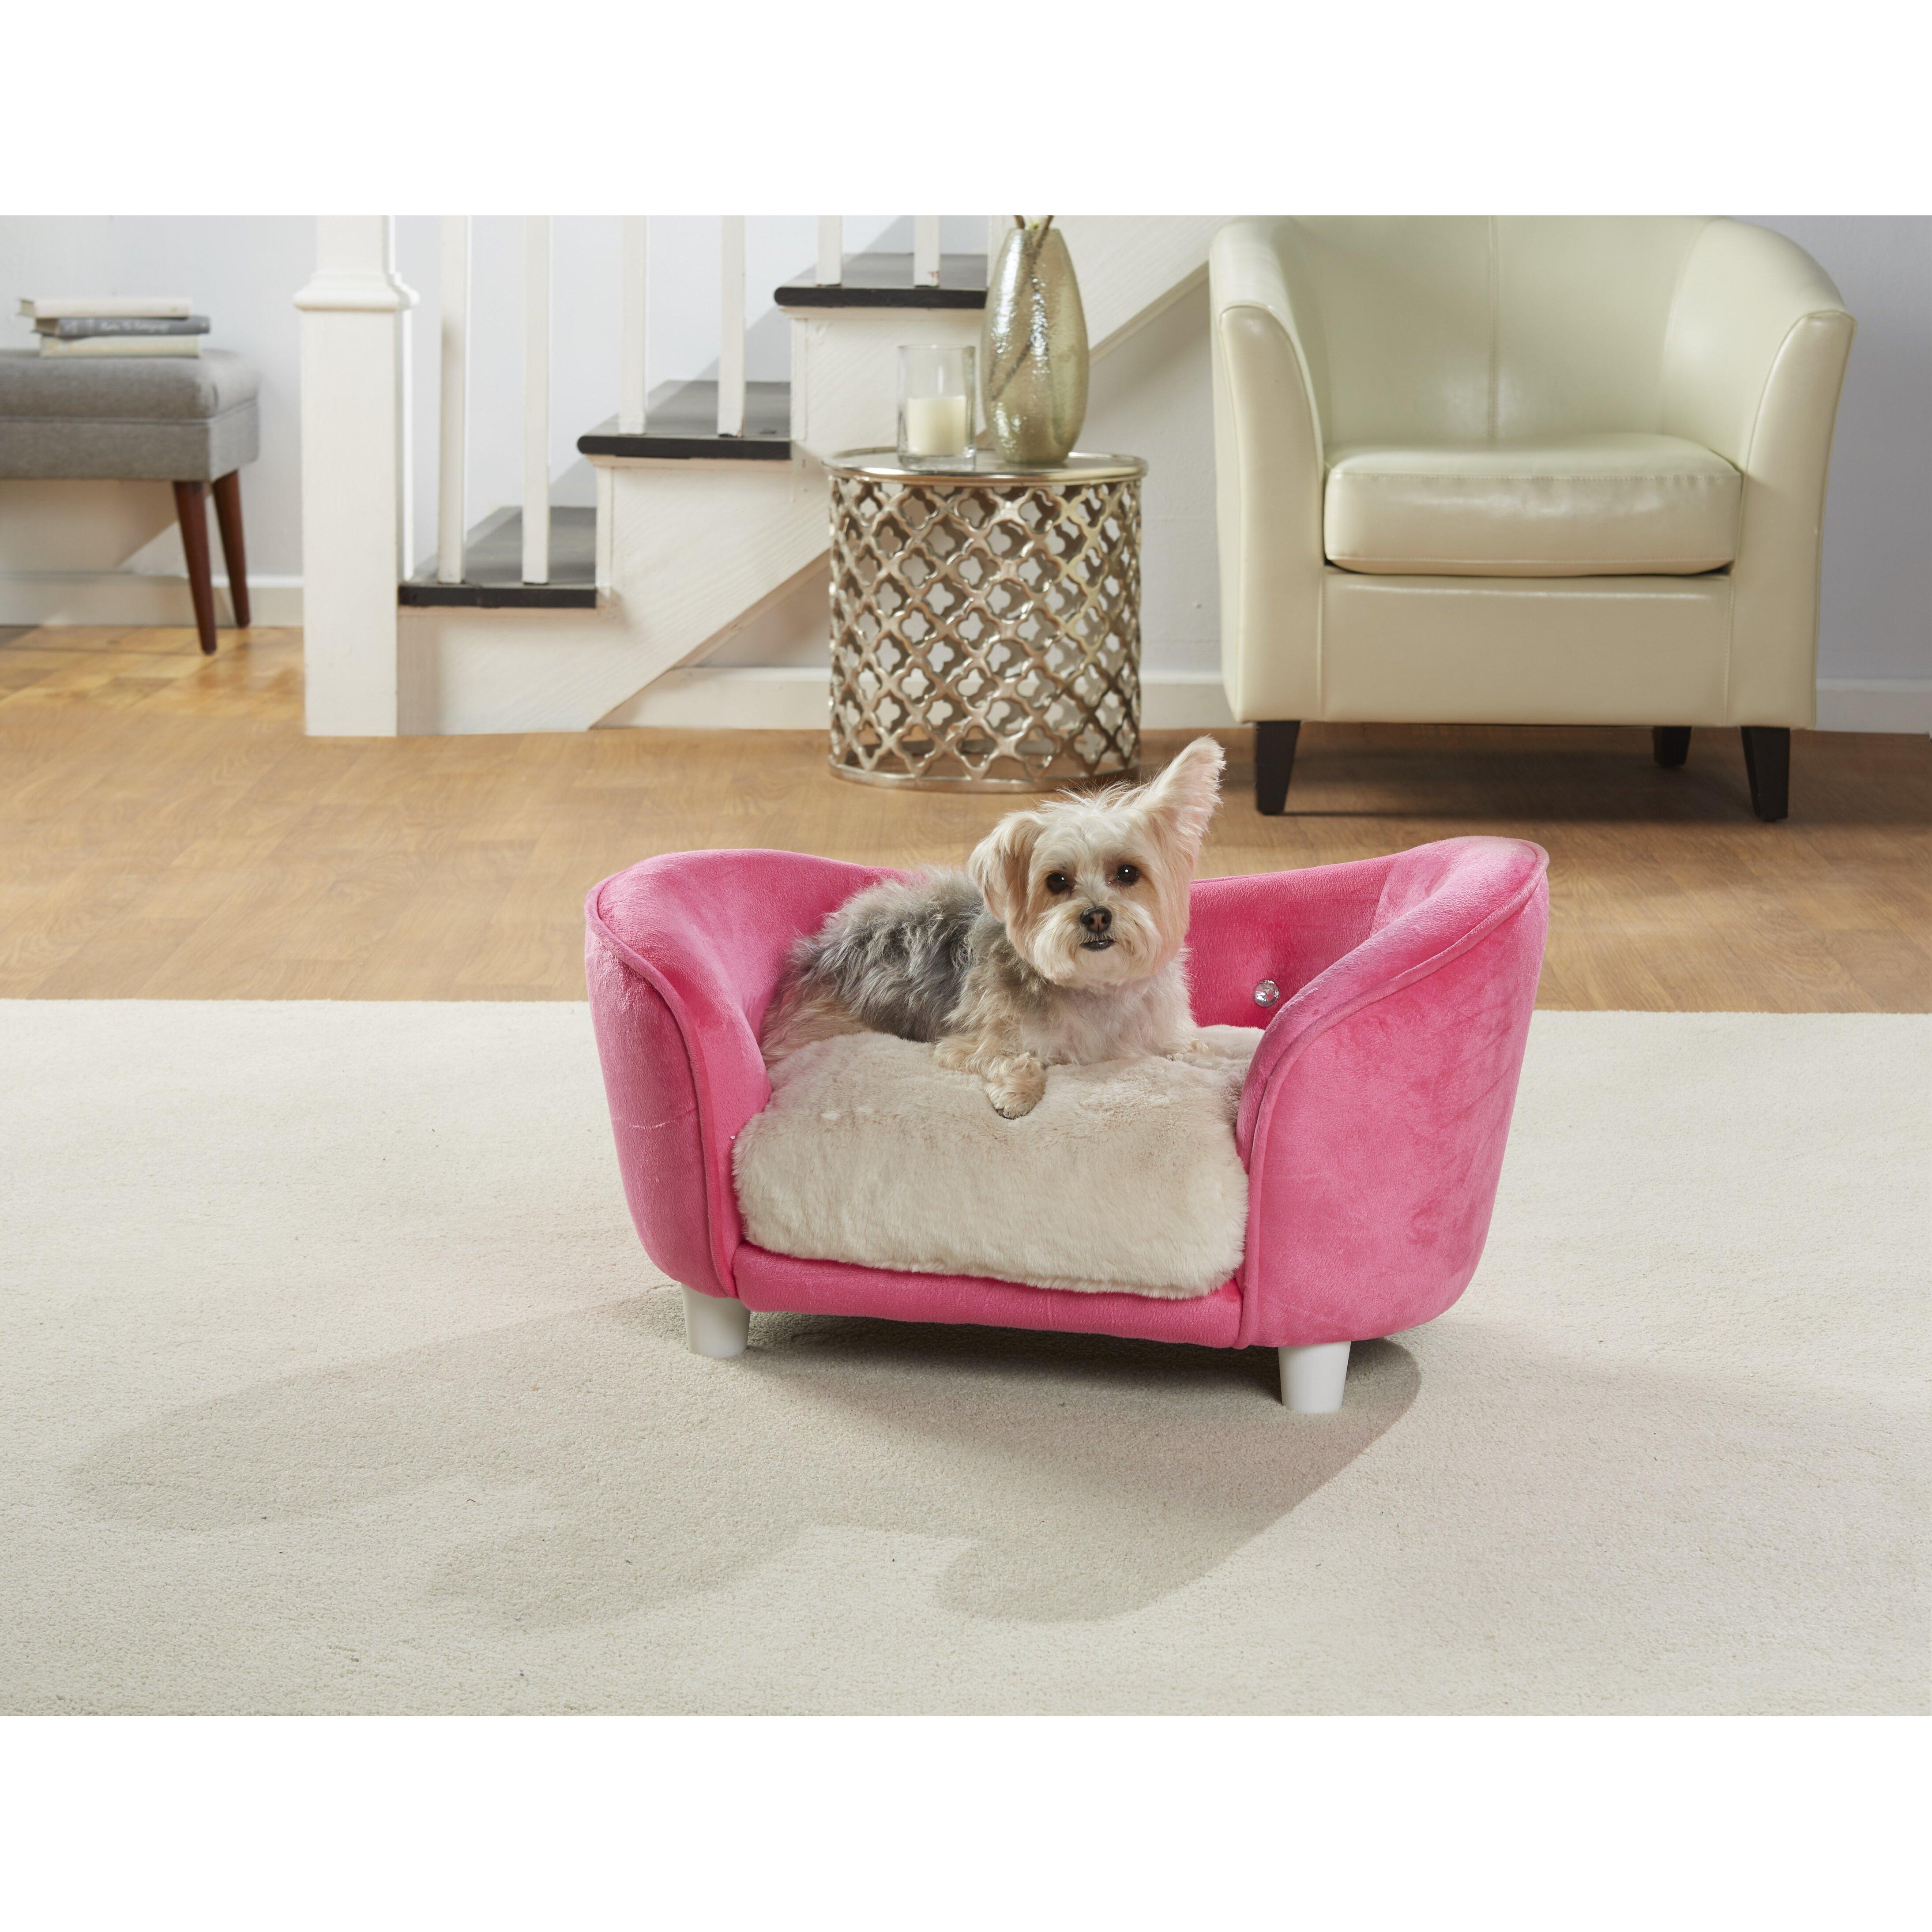 Enchanted Home Pet Kimmi Ultra Plush Snuggle Dog Sofa With Cushion Reviews Wayfair